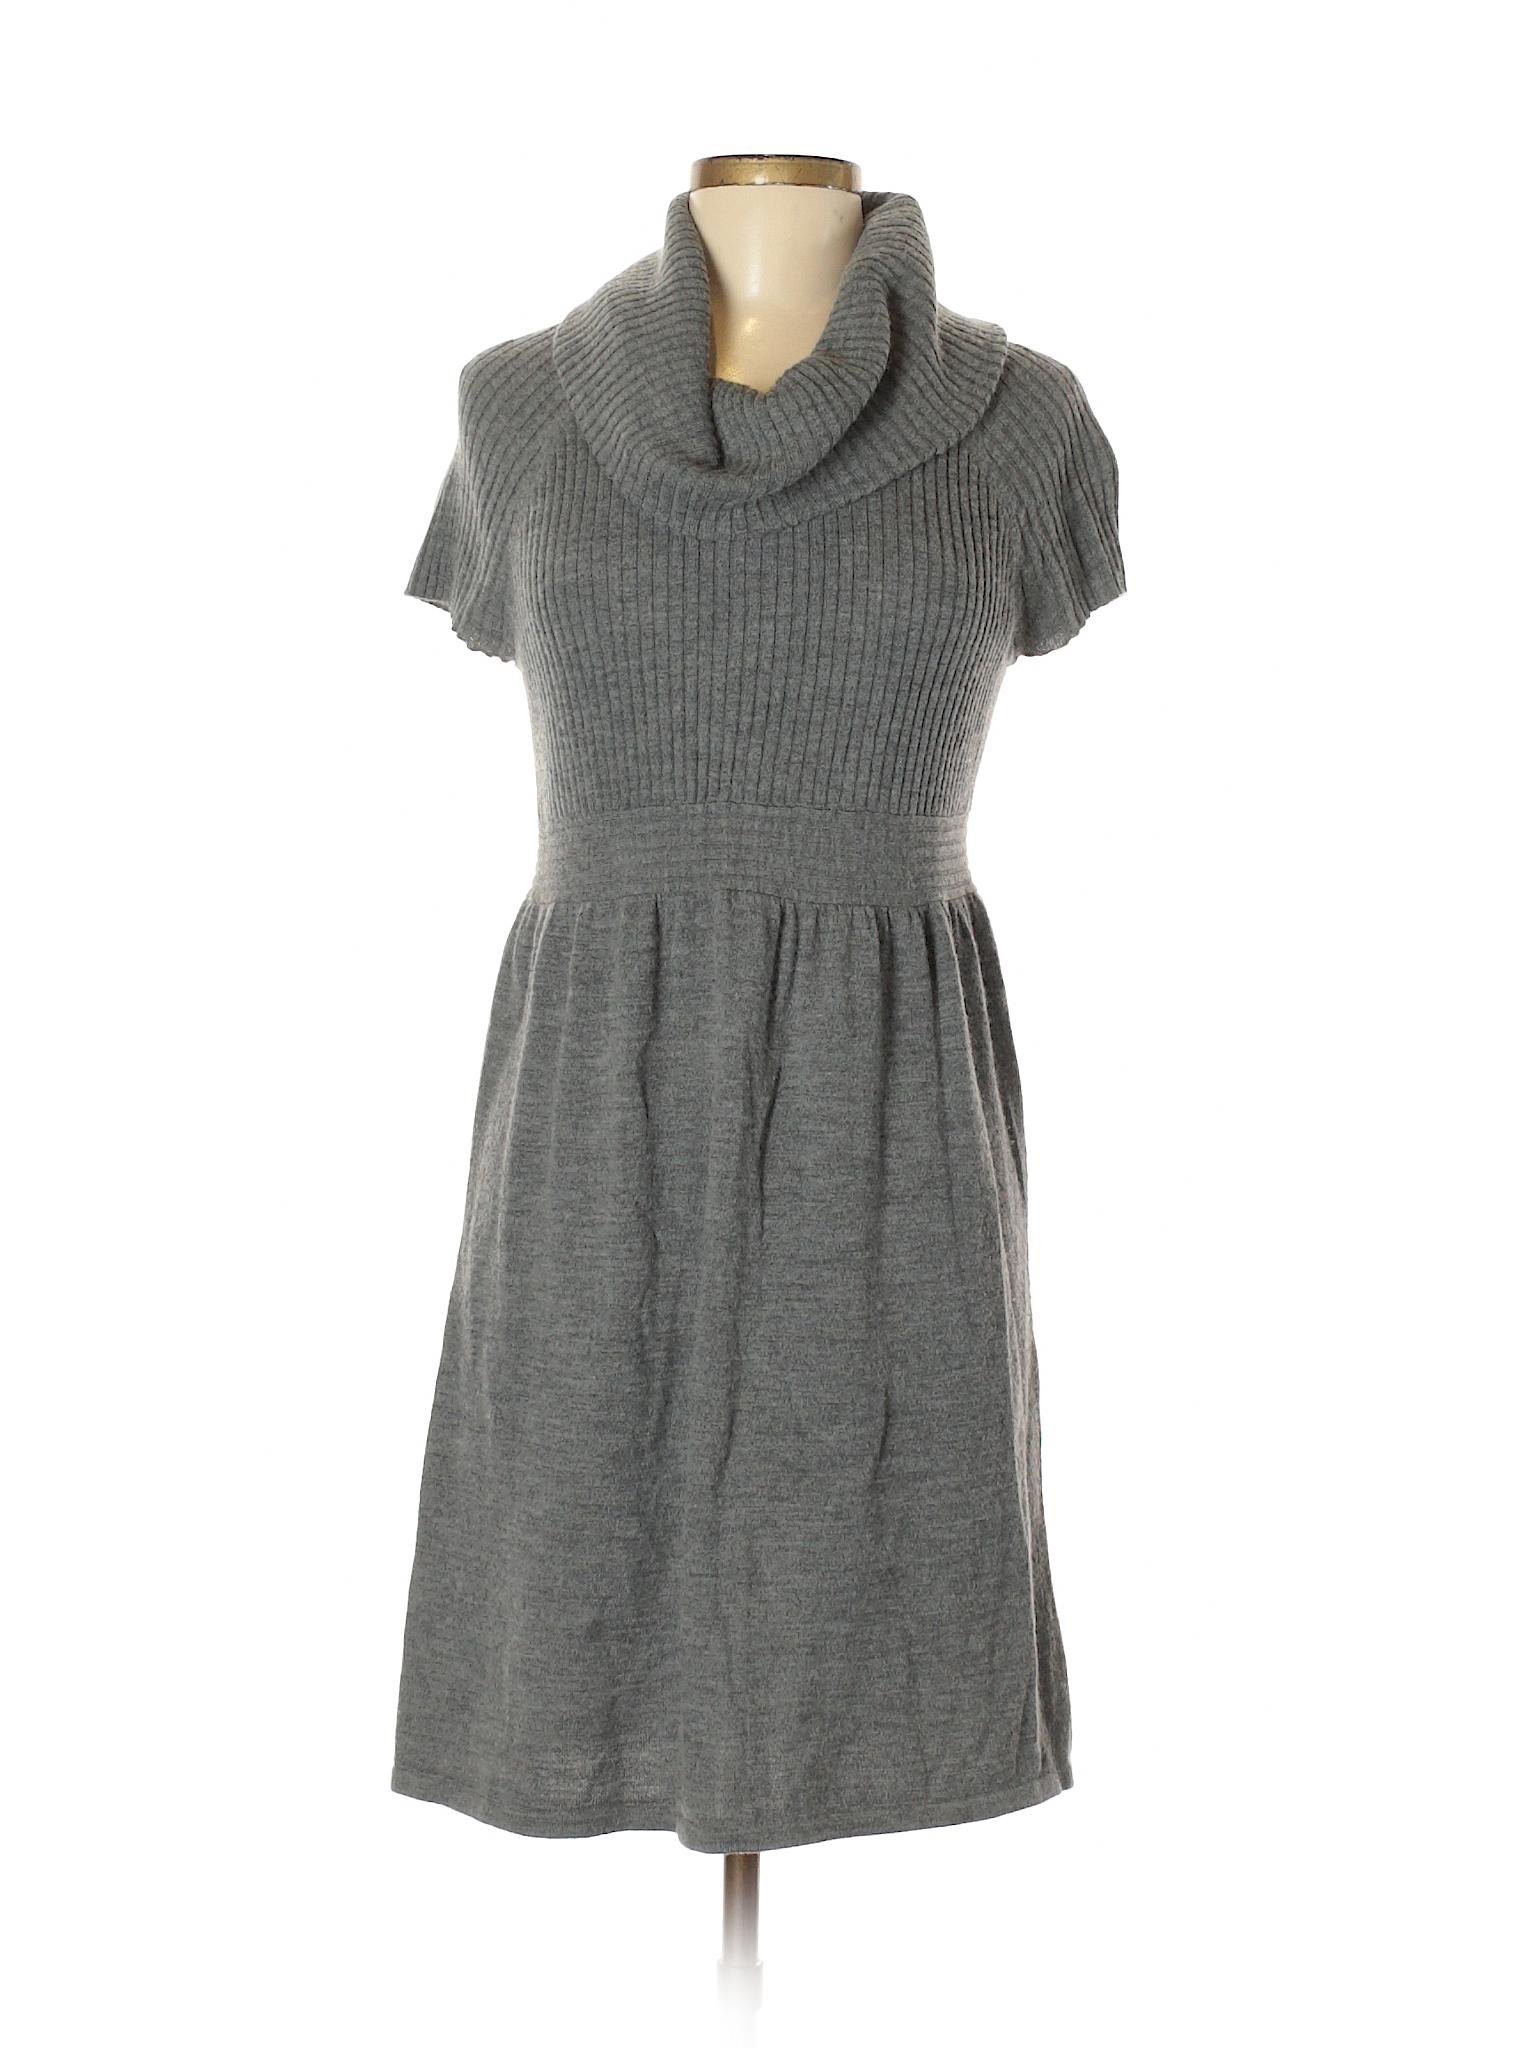 Loft Winter Casual Taylor Ann Boutique Dress TtwCxZ